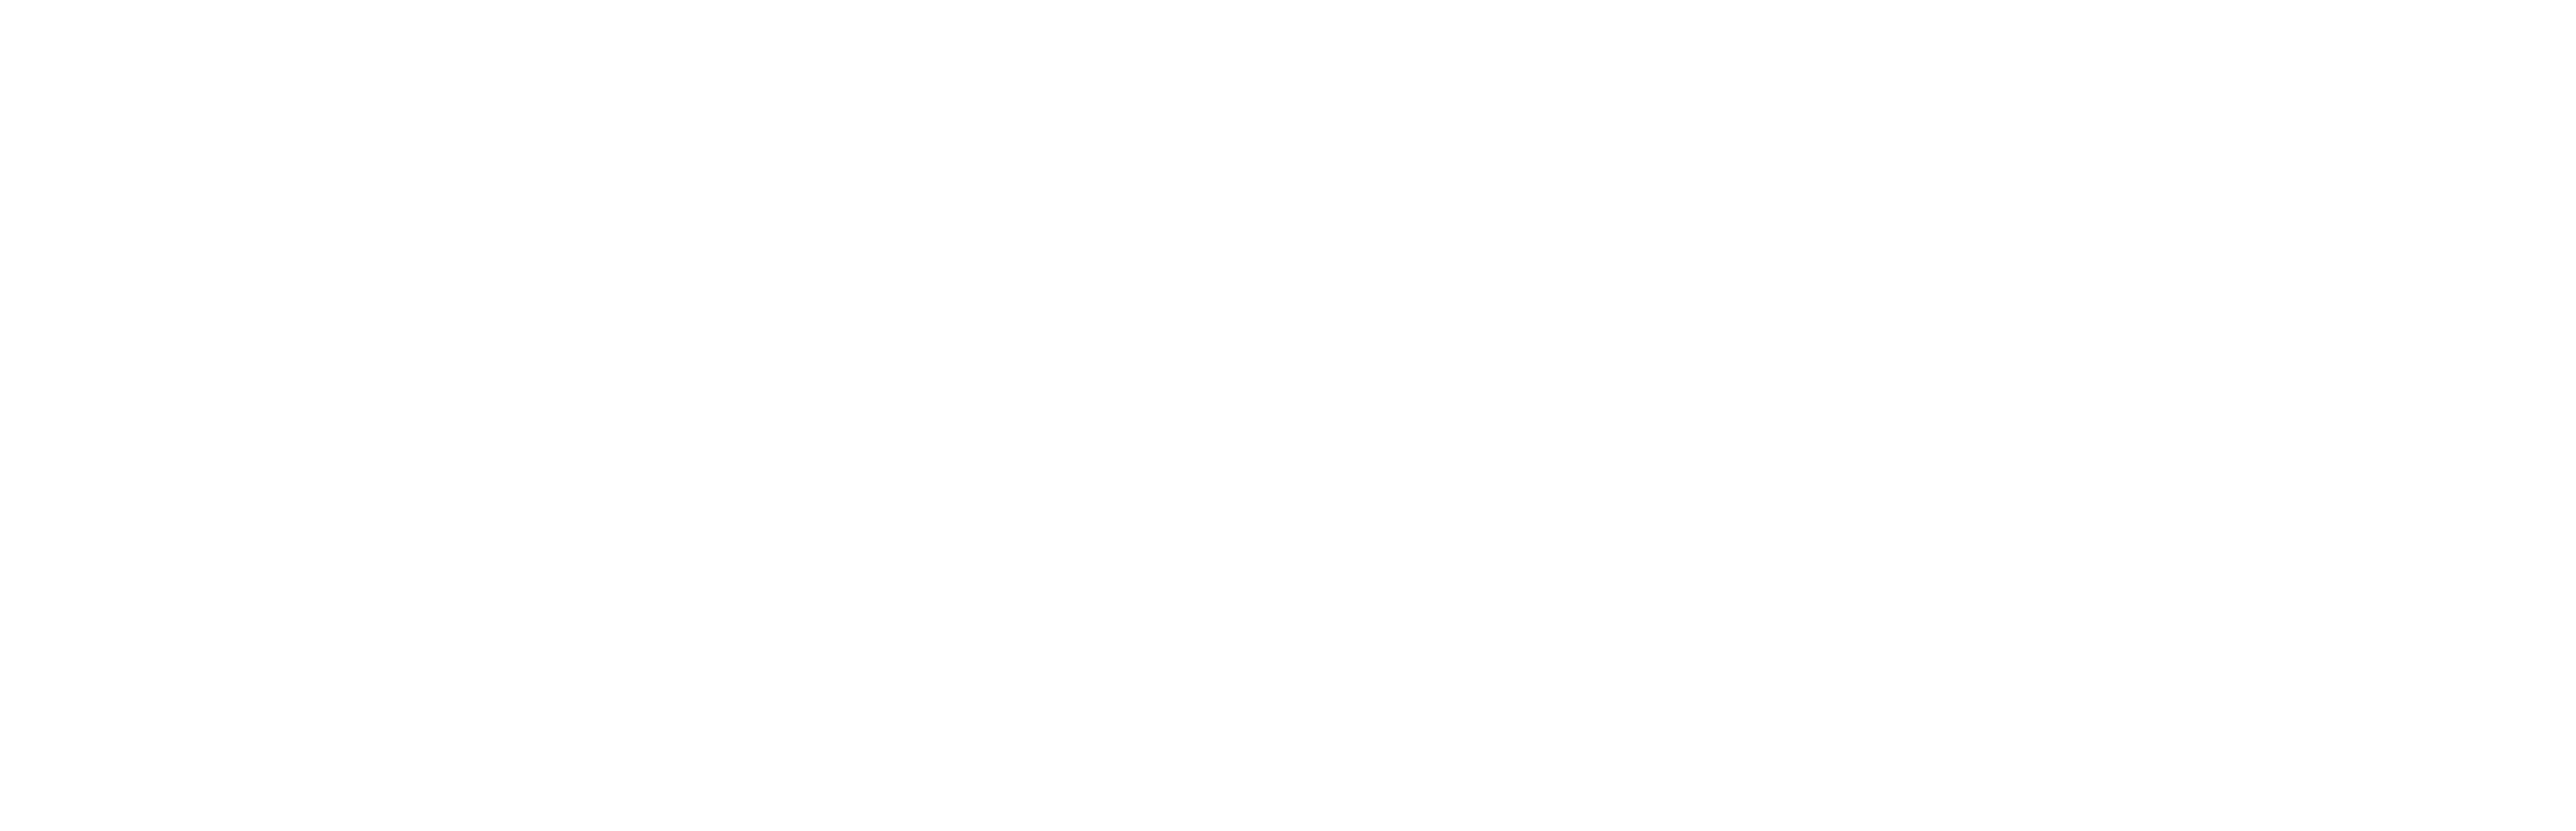 JURNAL PUBLIC RELATIONS INDONESIA